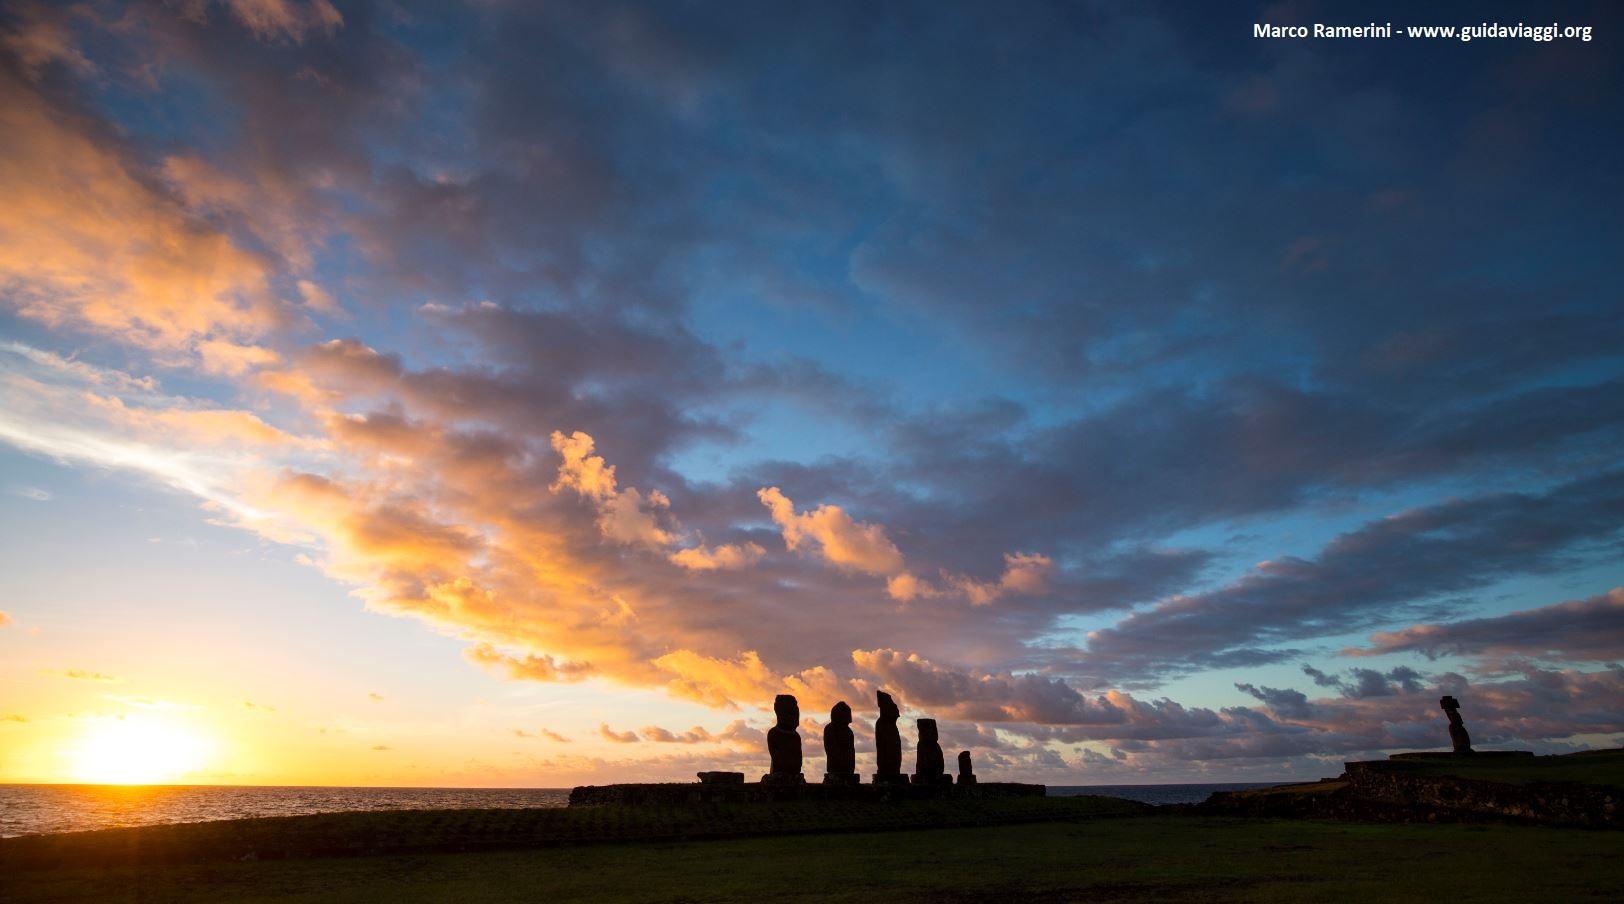 Ahu Tahai, Ilha de Páscoa, Chile. Autor e Copyright Marco Ramerini